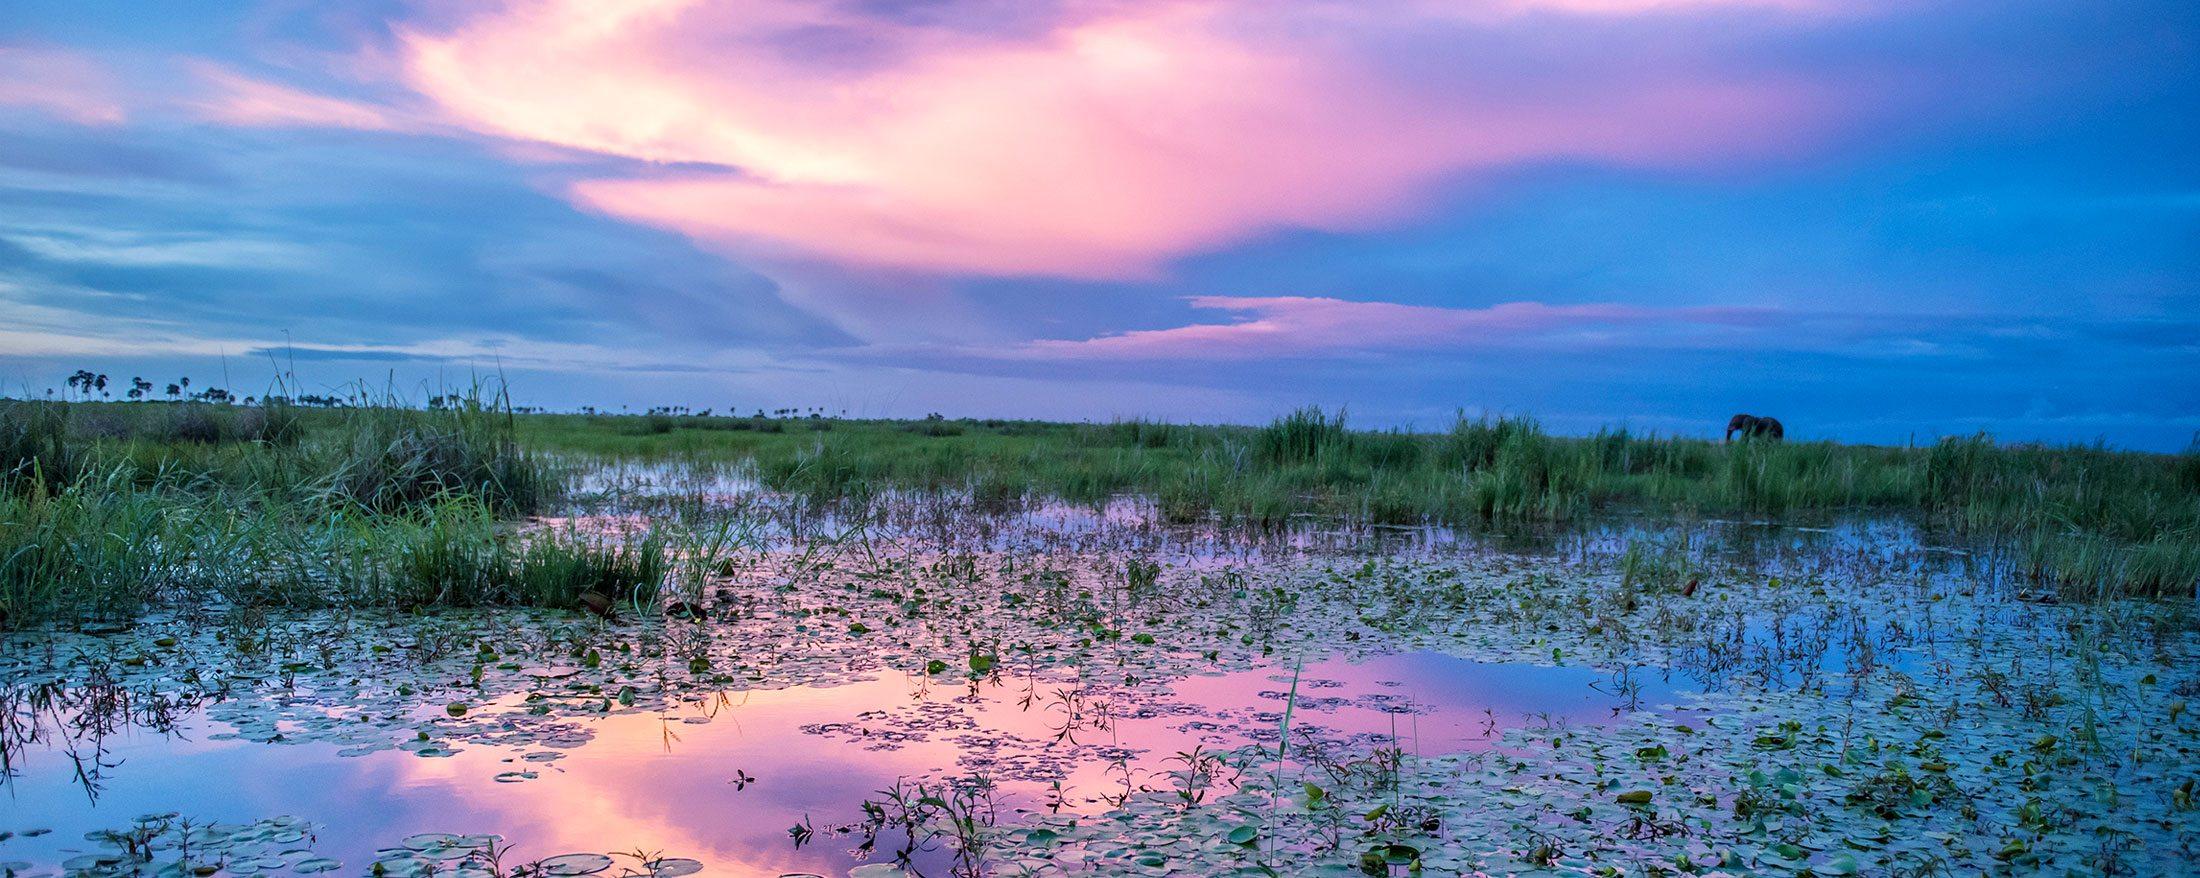 Linyanti safari | An enchanting part of Botswana.